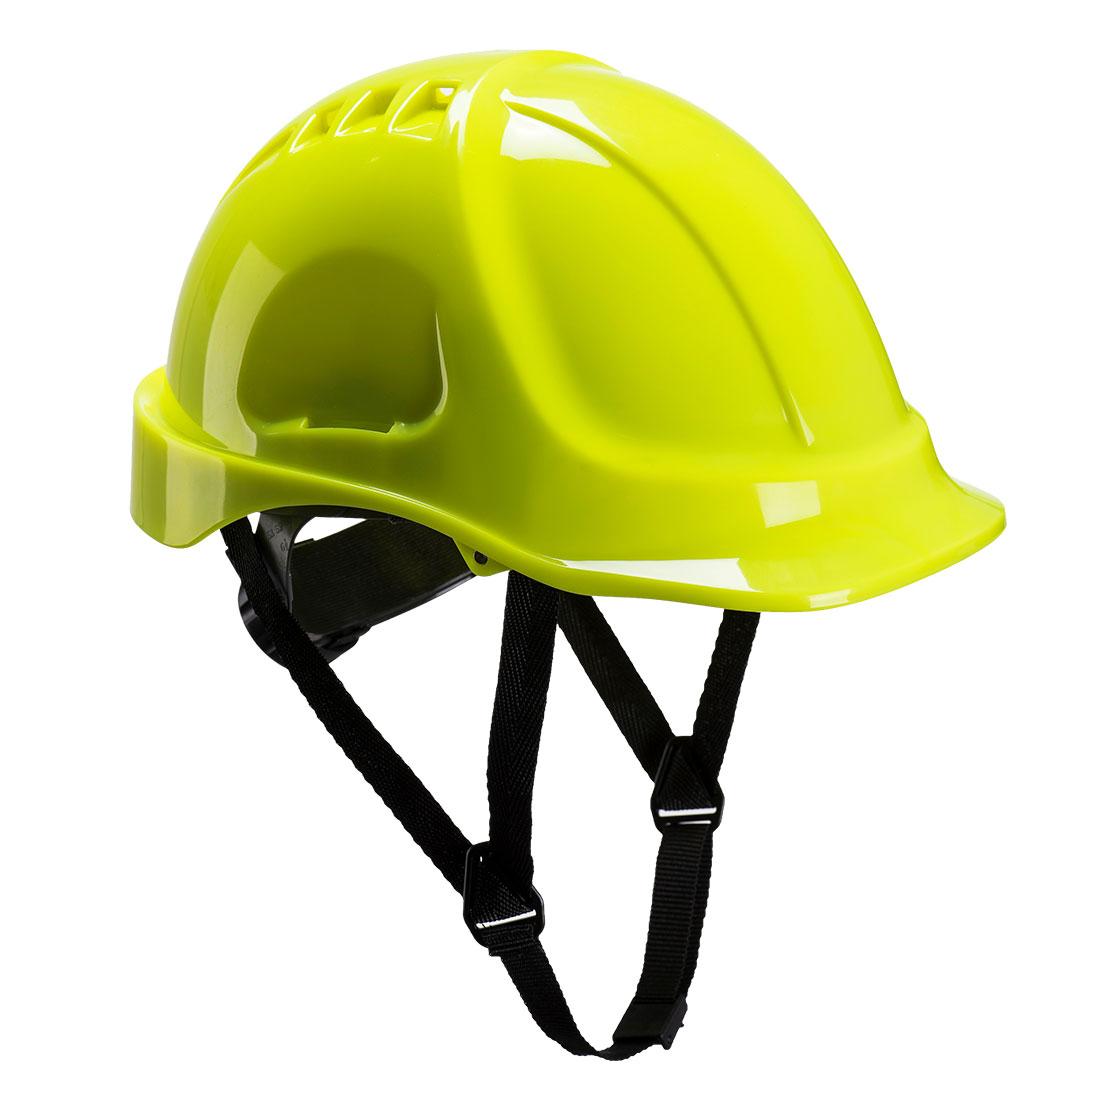 Portwest Endurance Helmet